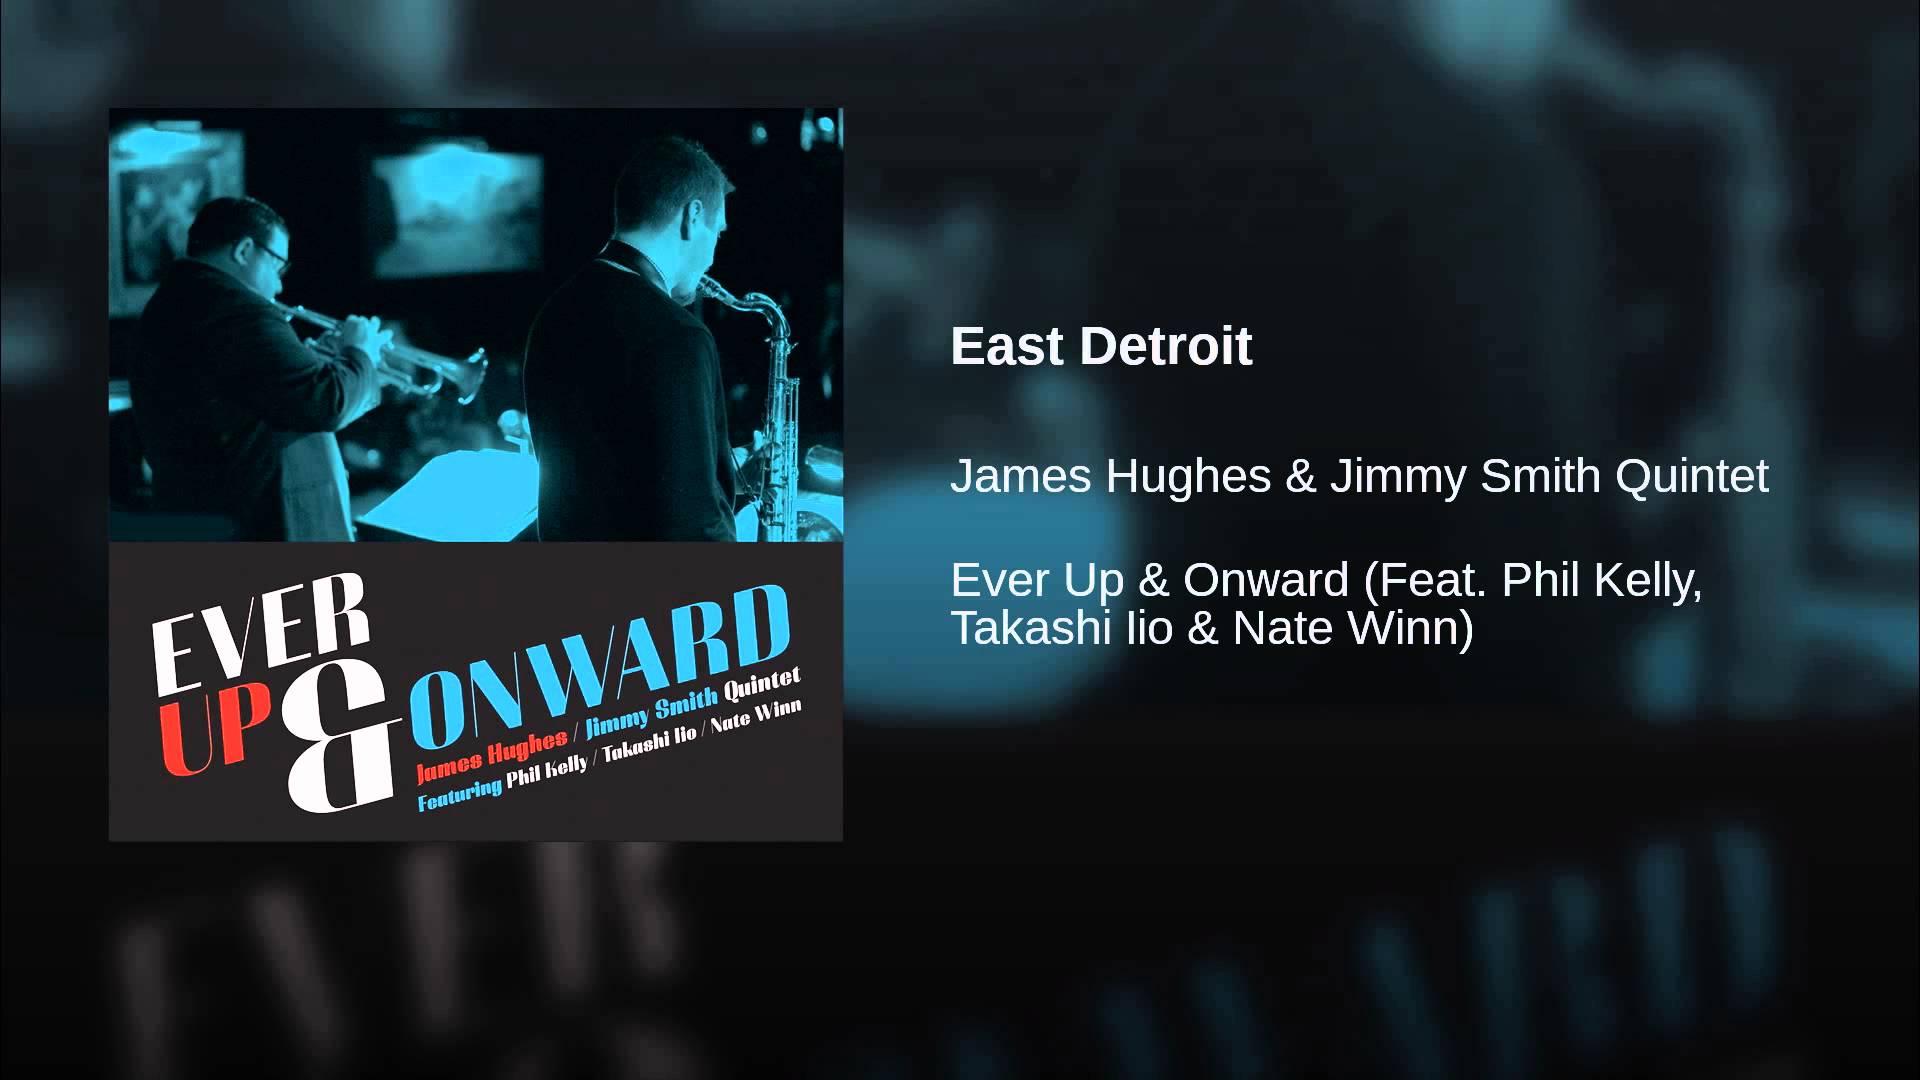 Hughes-Smith Quintet climbs 'Ever Up & Onward' for modern Detroit post-bop jazz